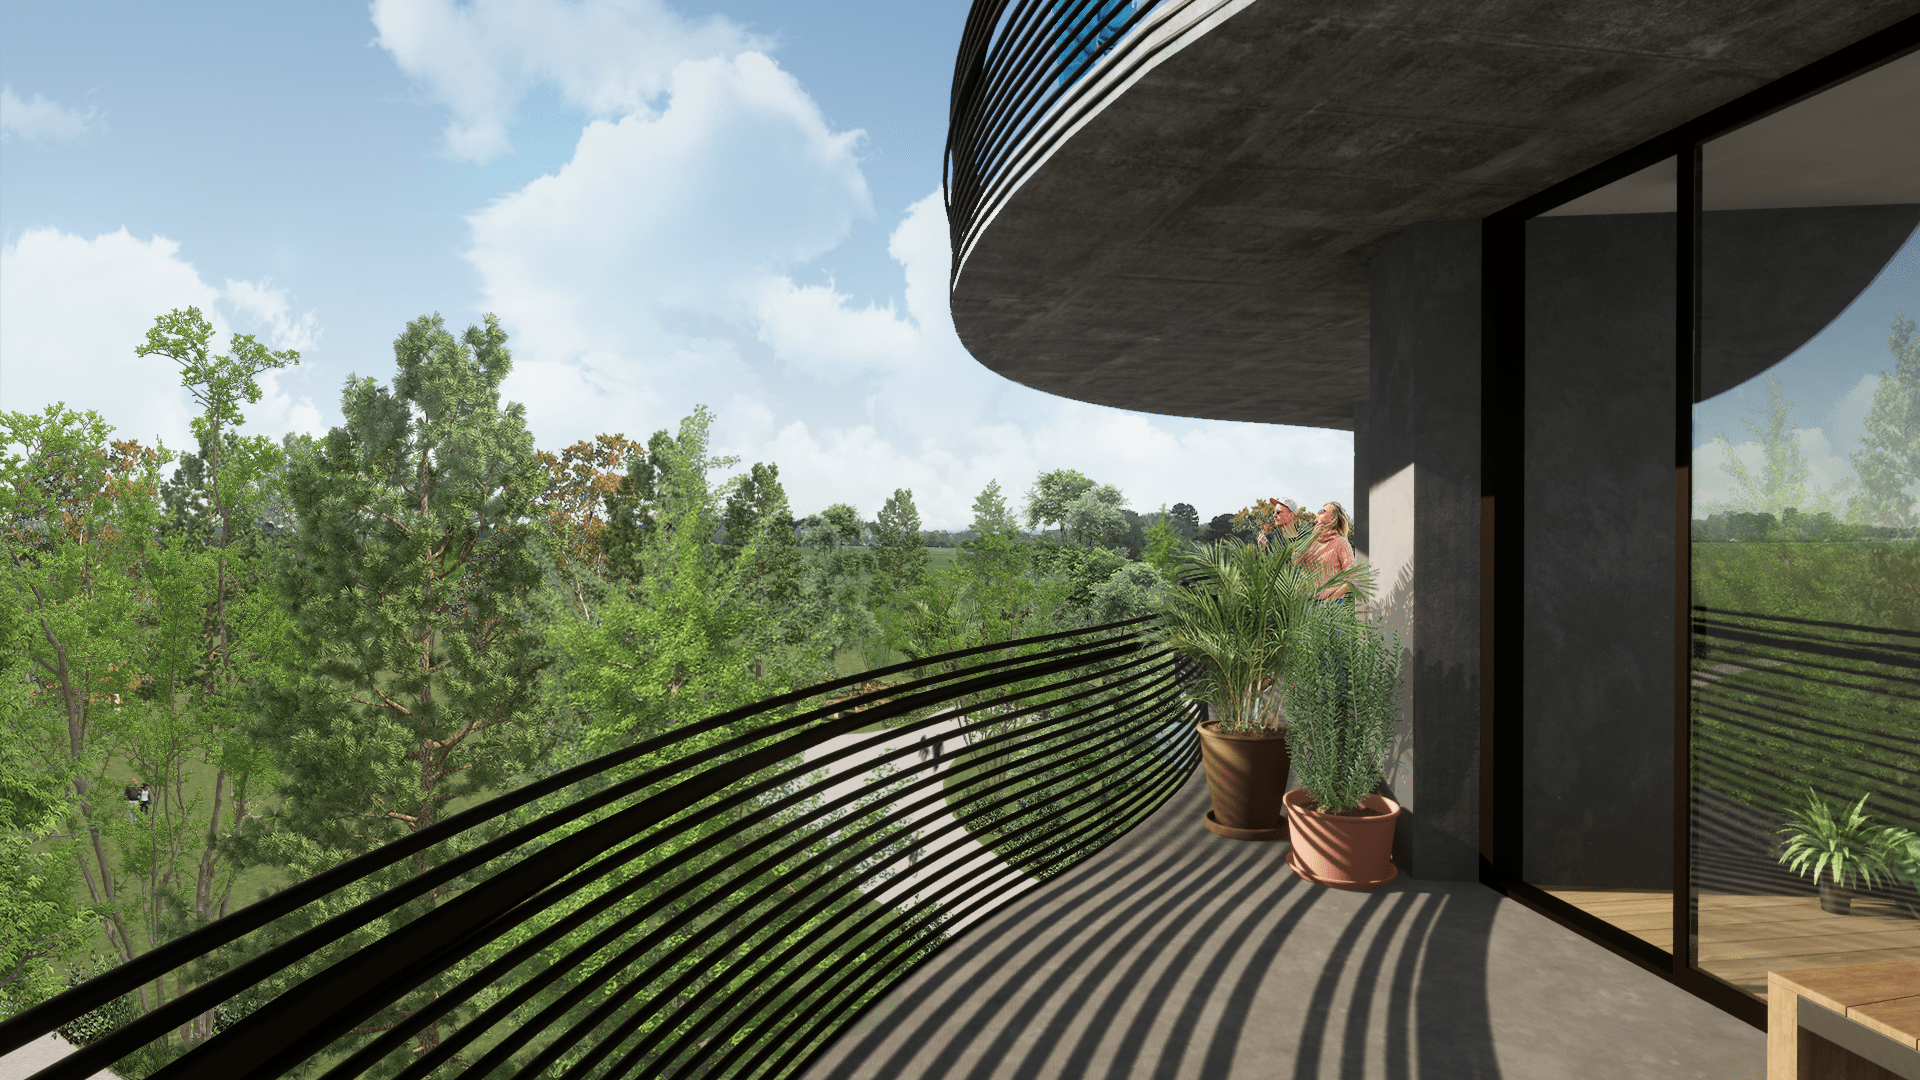 The Hive Balcony